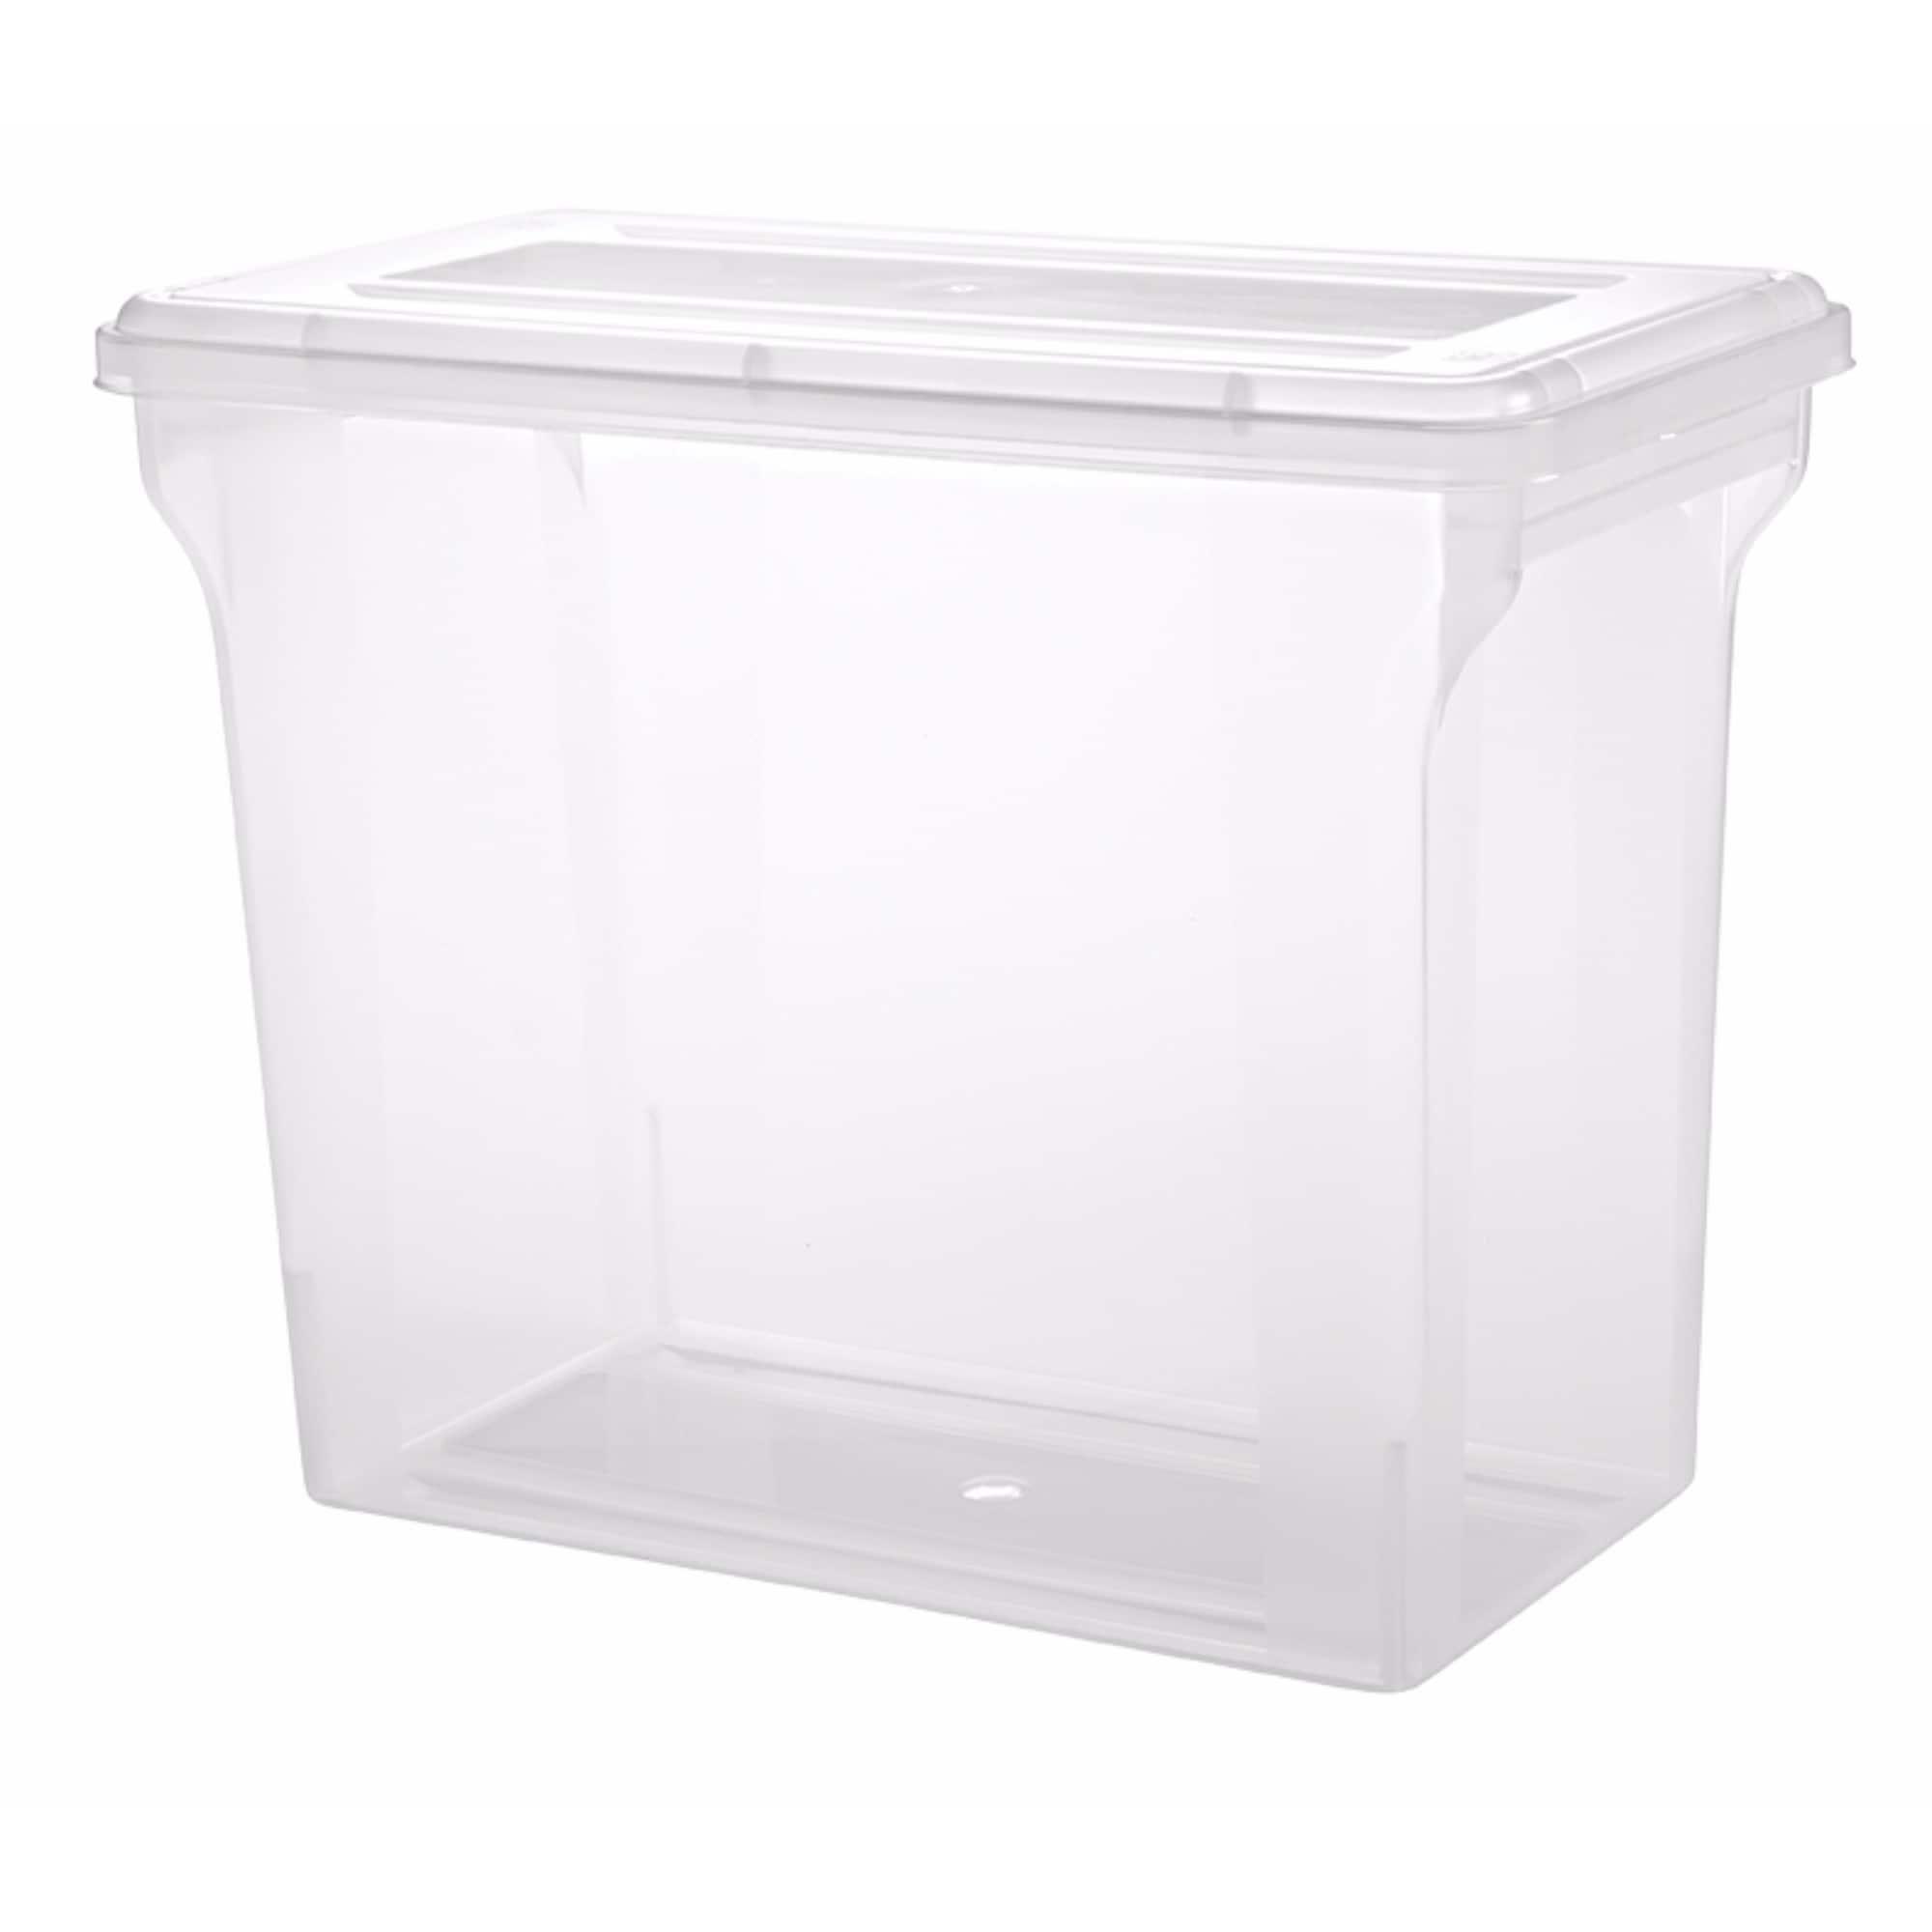 Shop IRIS 12 x 12 inch Scrapbook File Storage Box Pack of 4 Free